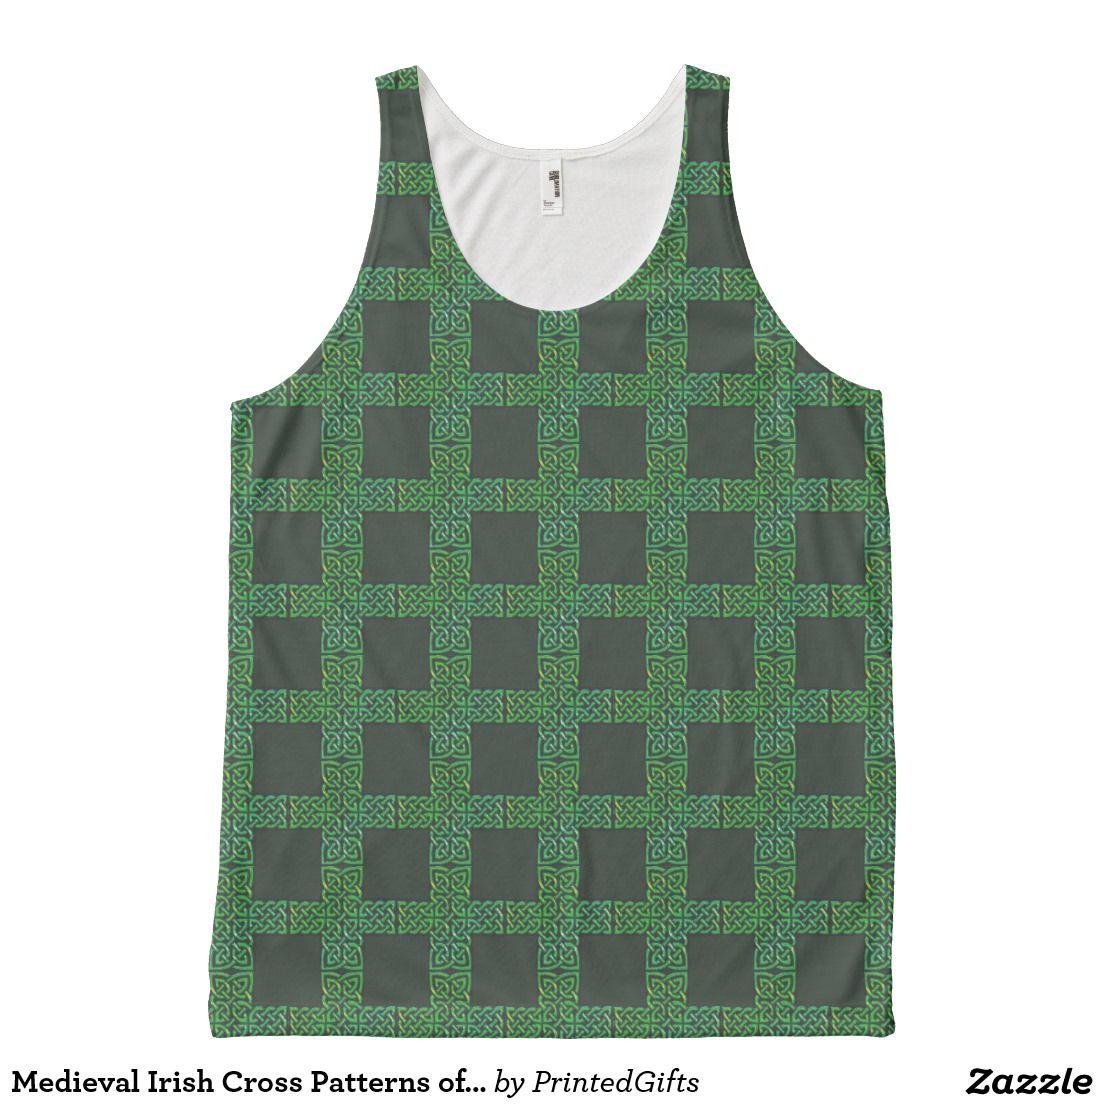 Medieval Irish Cross Patterns of Celtic Knots